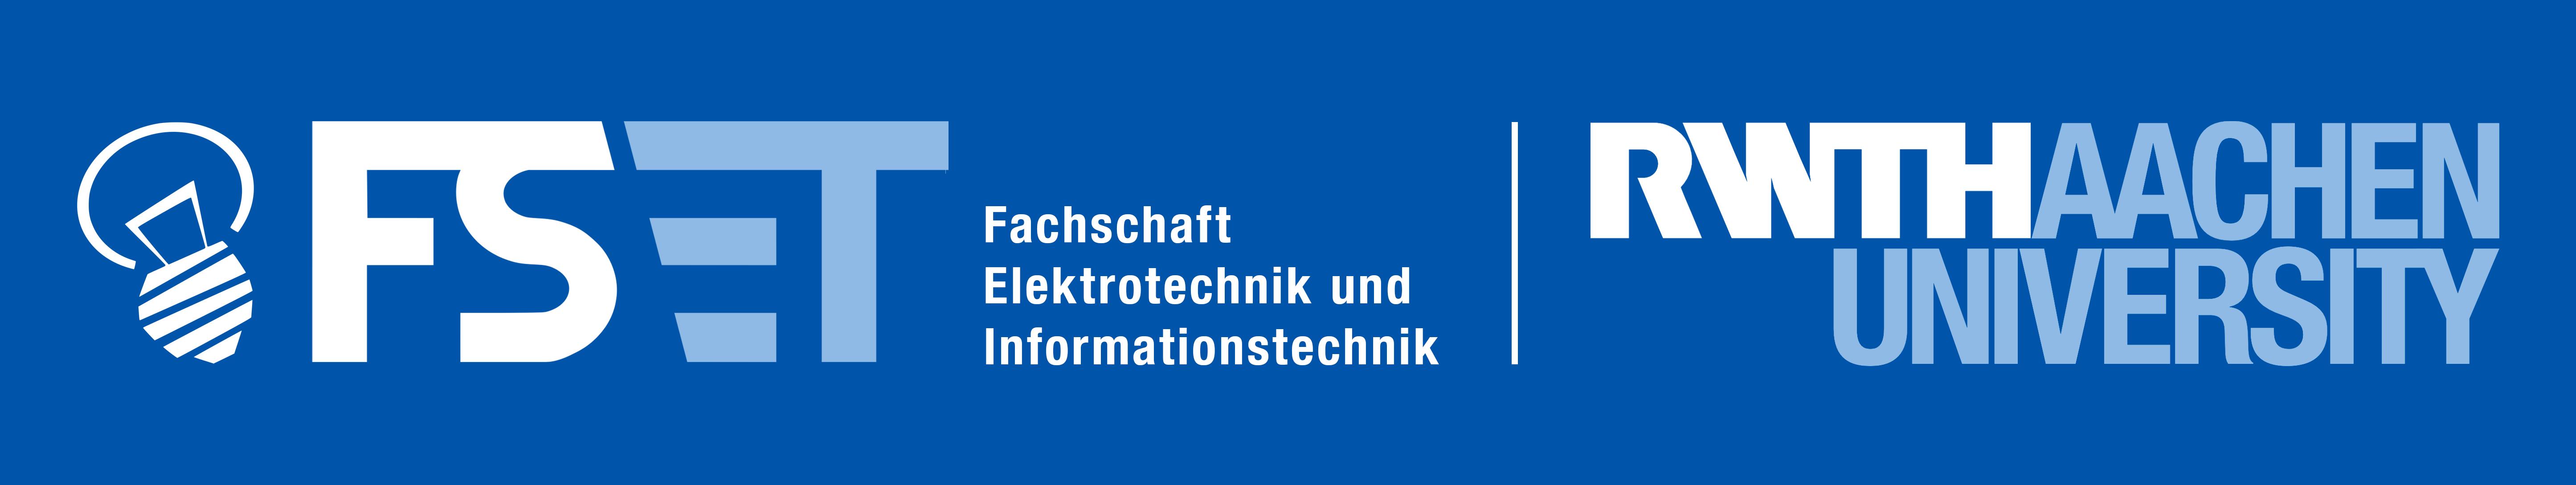 werbung/quelldateien/martin/LIP plakate/FSET + RWTH-Logo 1.png